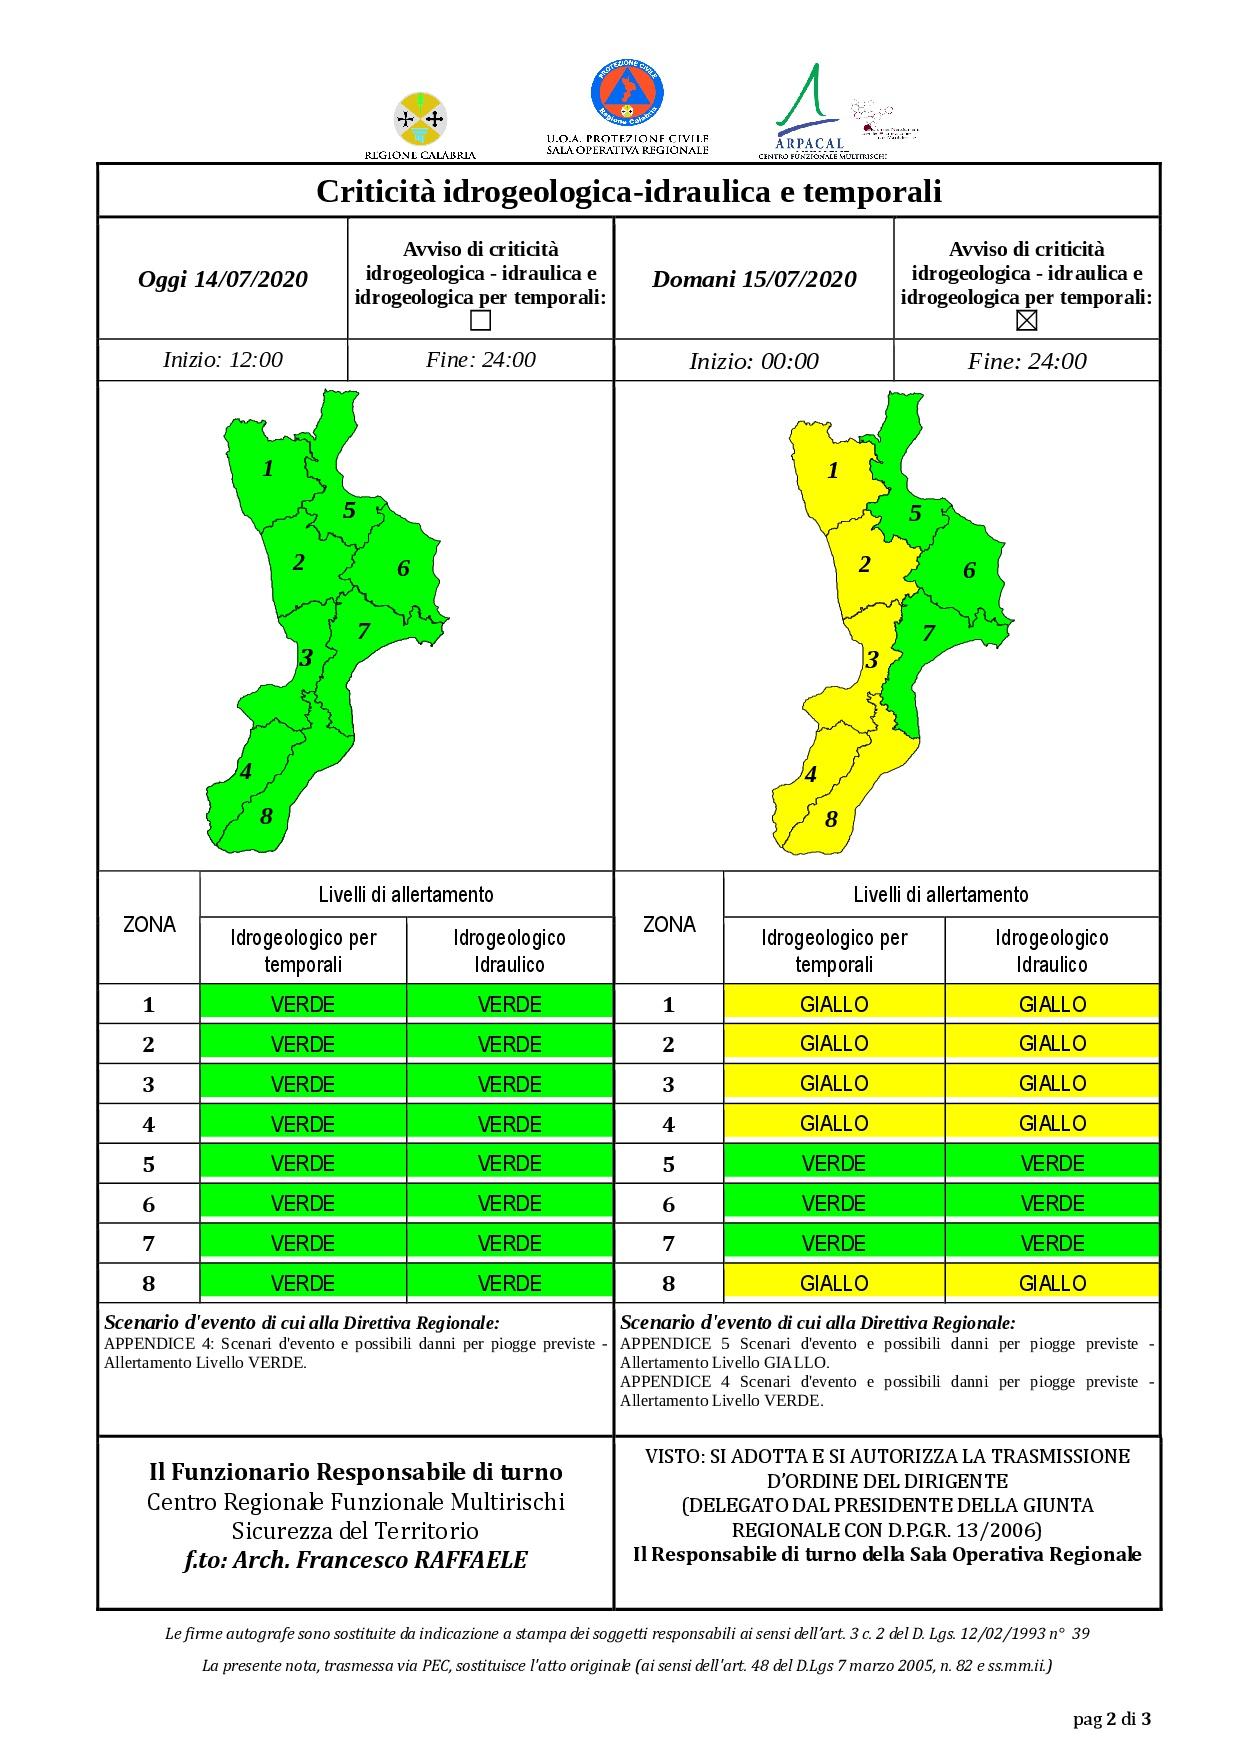 Criticità idrogeologica-idraulica e temporali in Calabria 14-07-2020